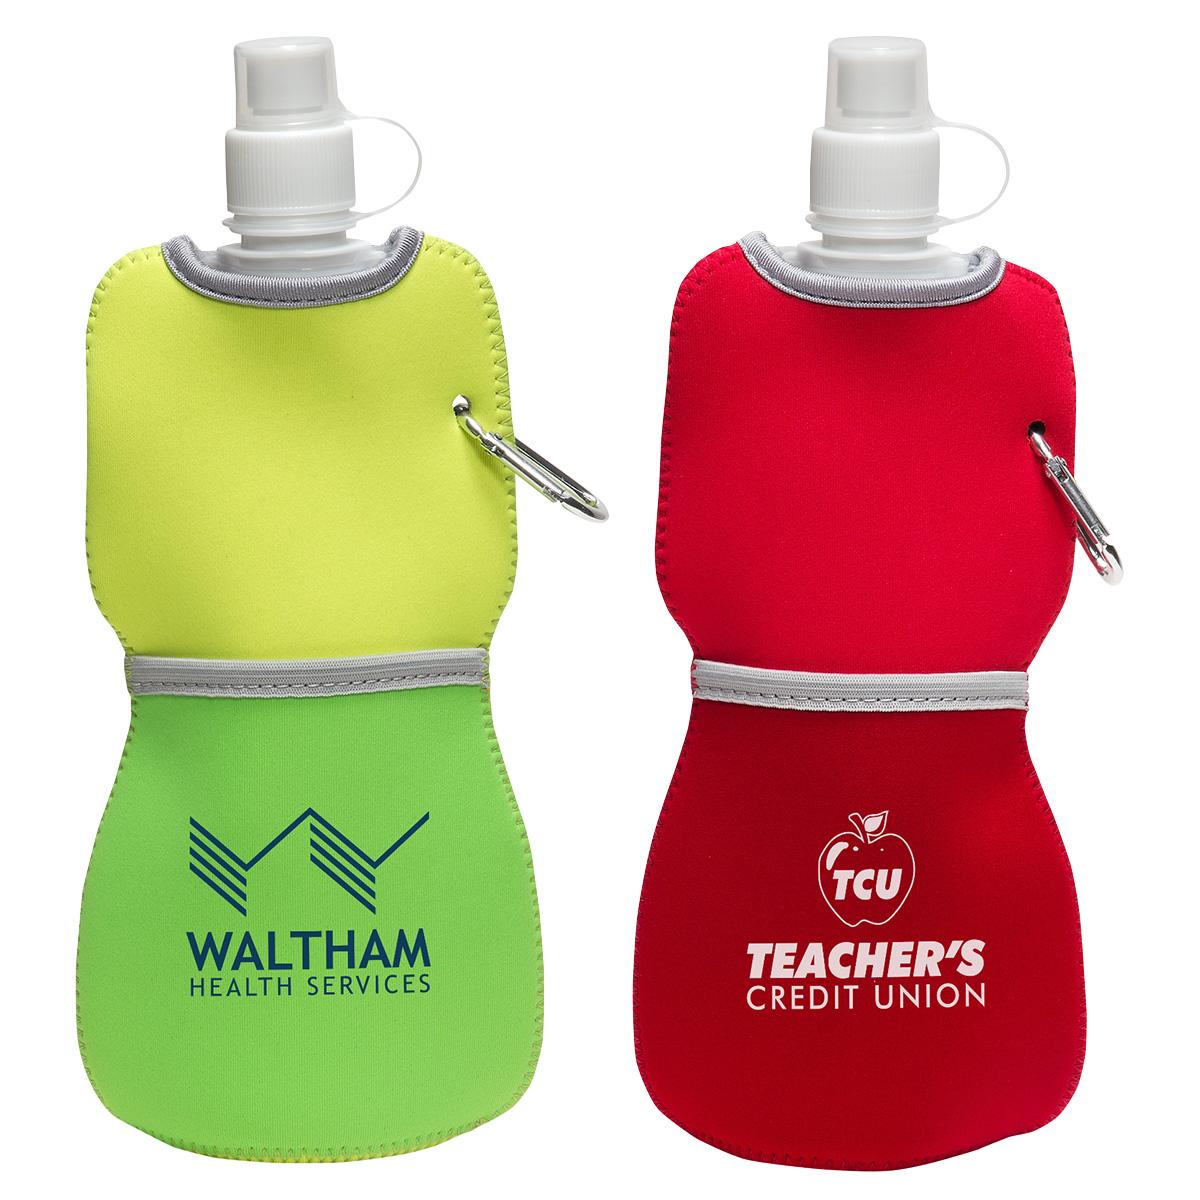 16 Oz. Flex Water Bottle w/ Neoprene Insulator, WKA-FW15 - 1 Colour Imprint